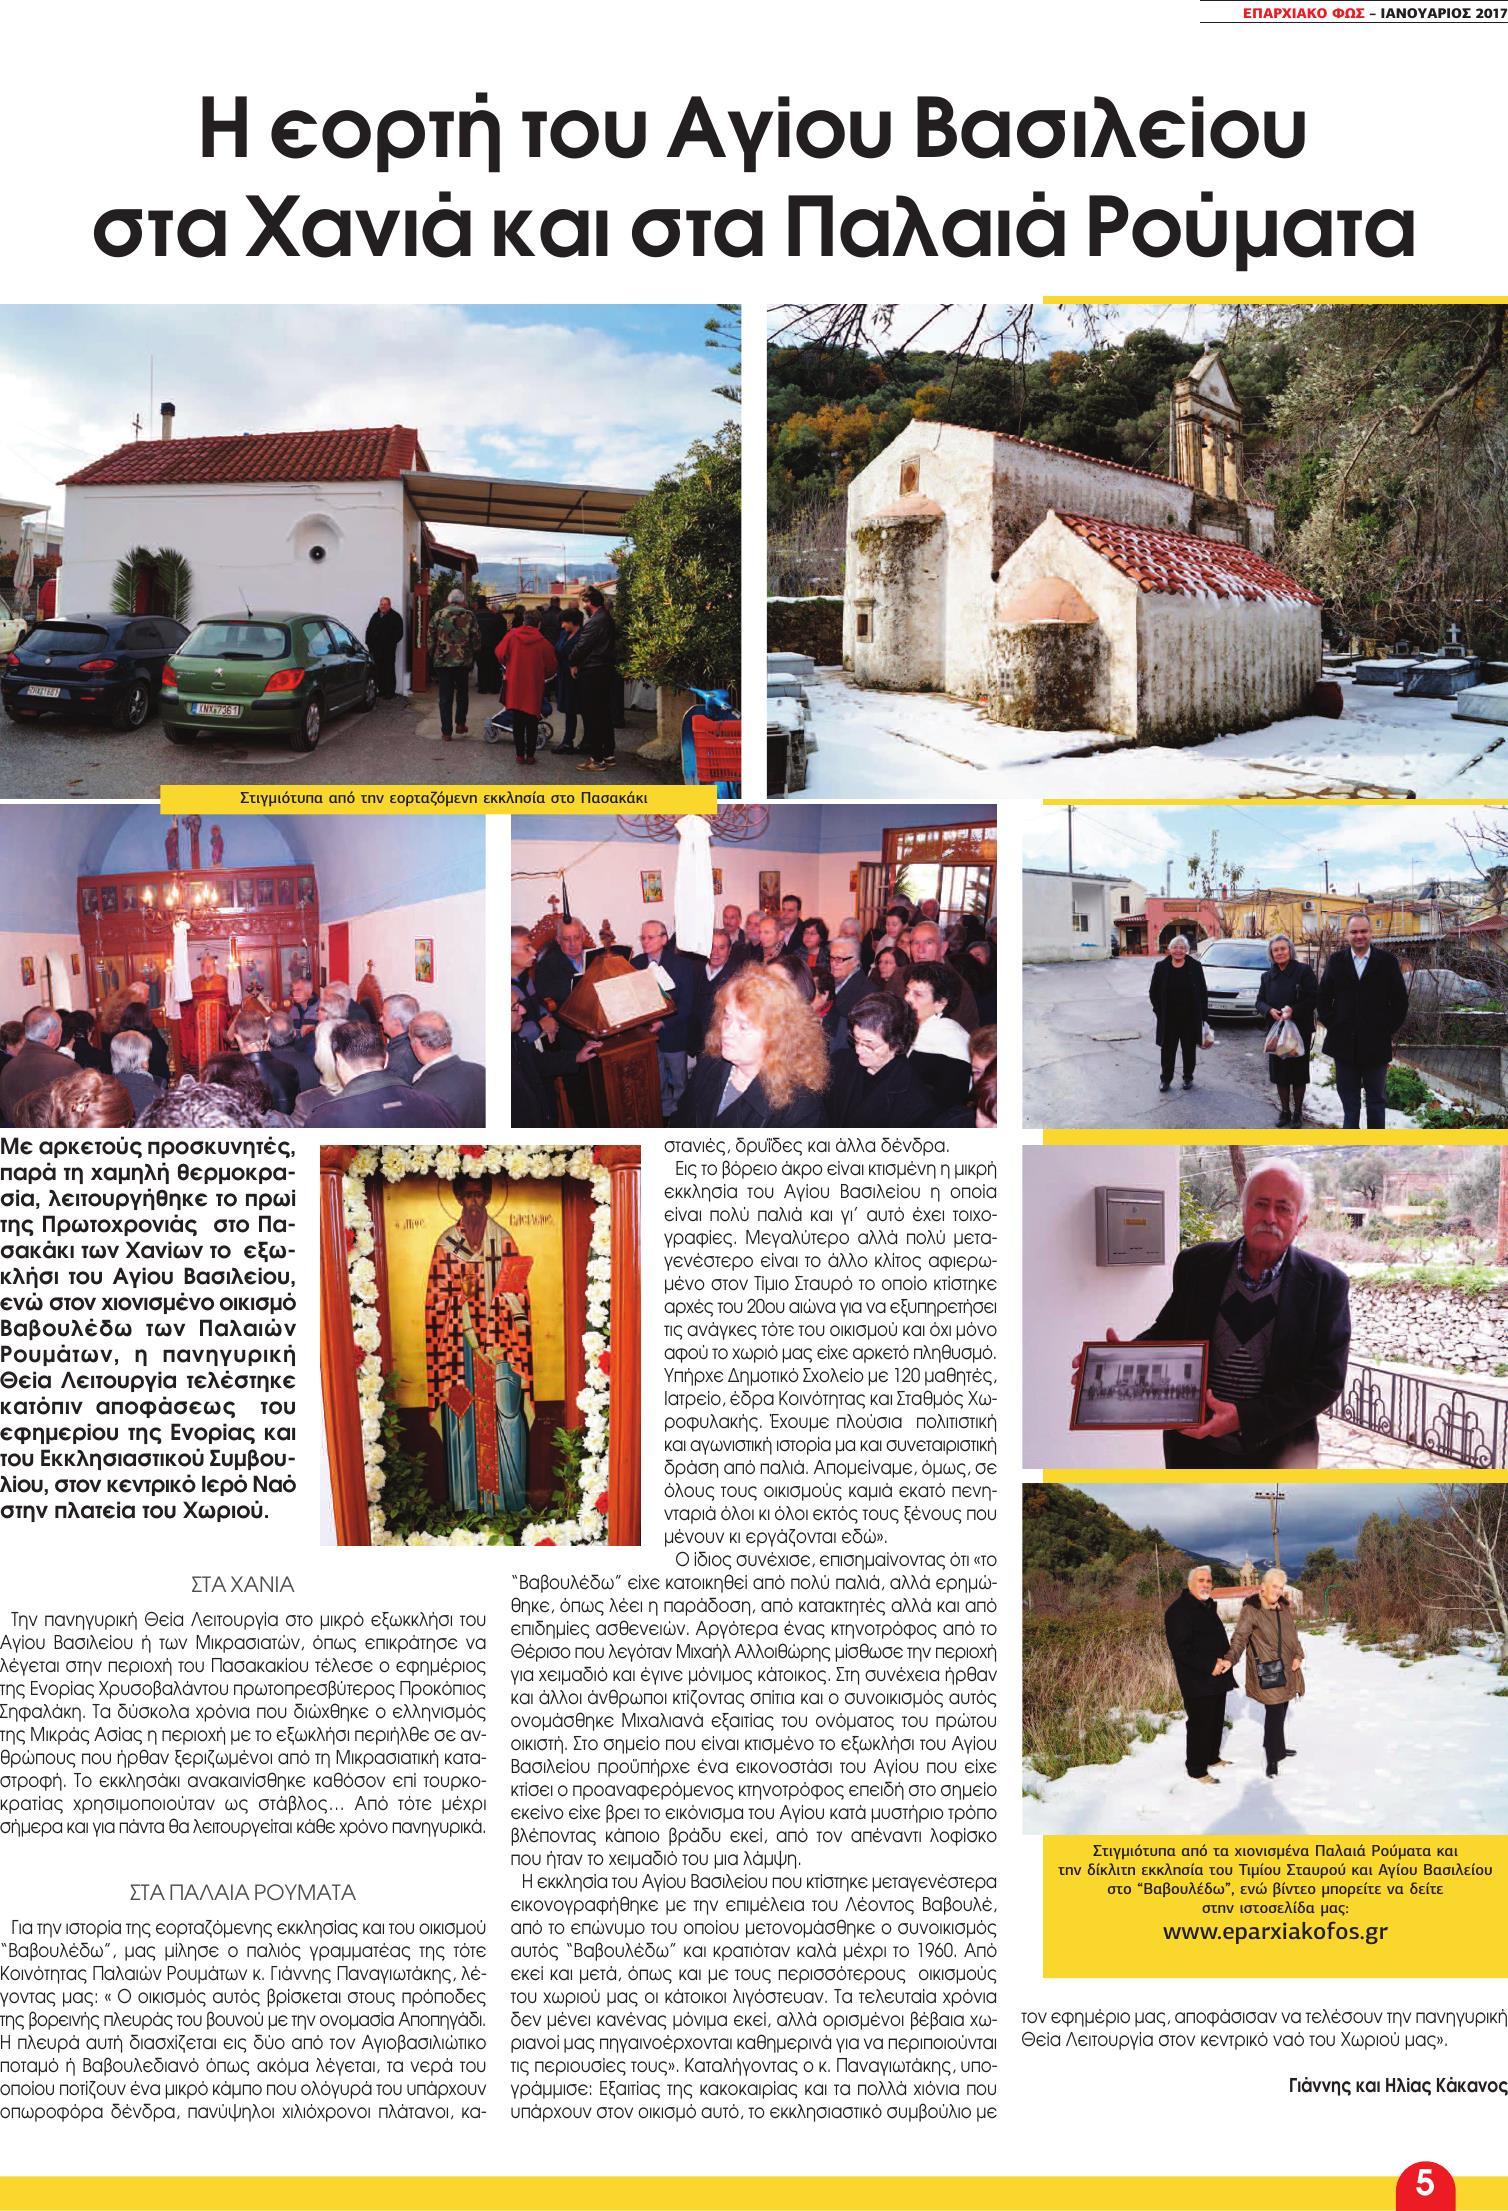 16 KAKANOS (Page 05)